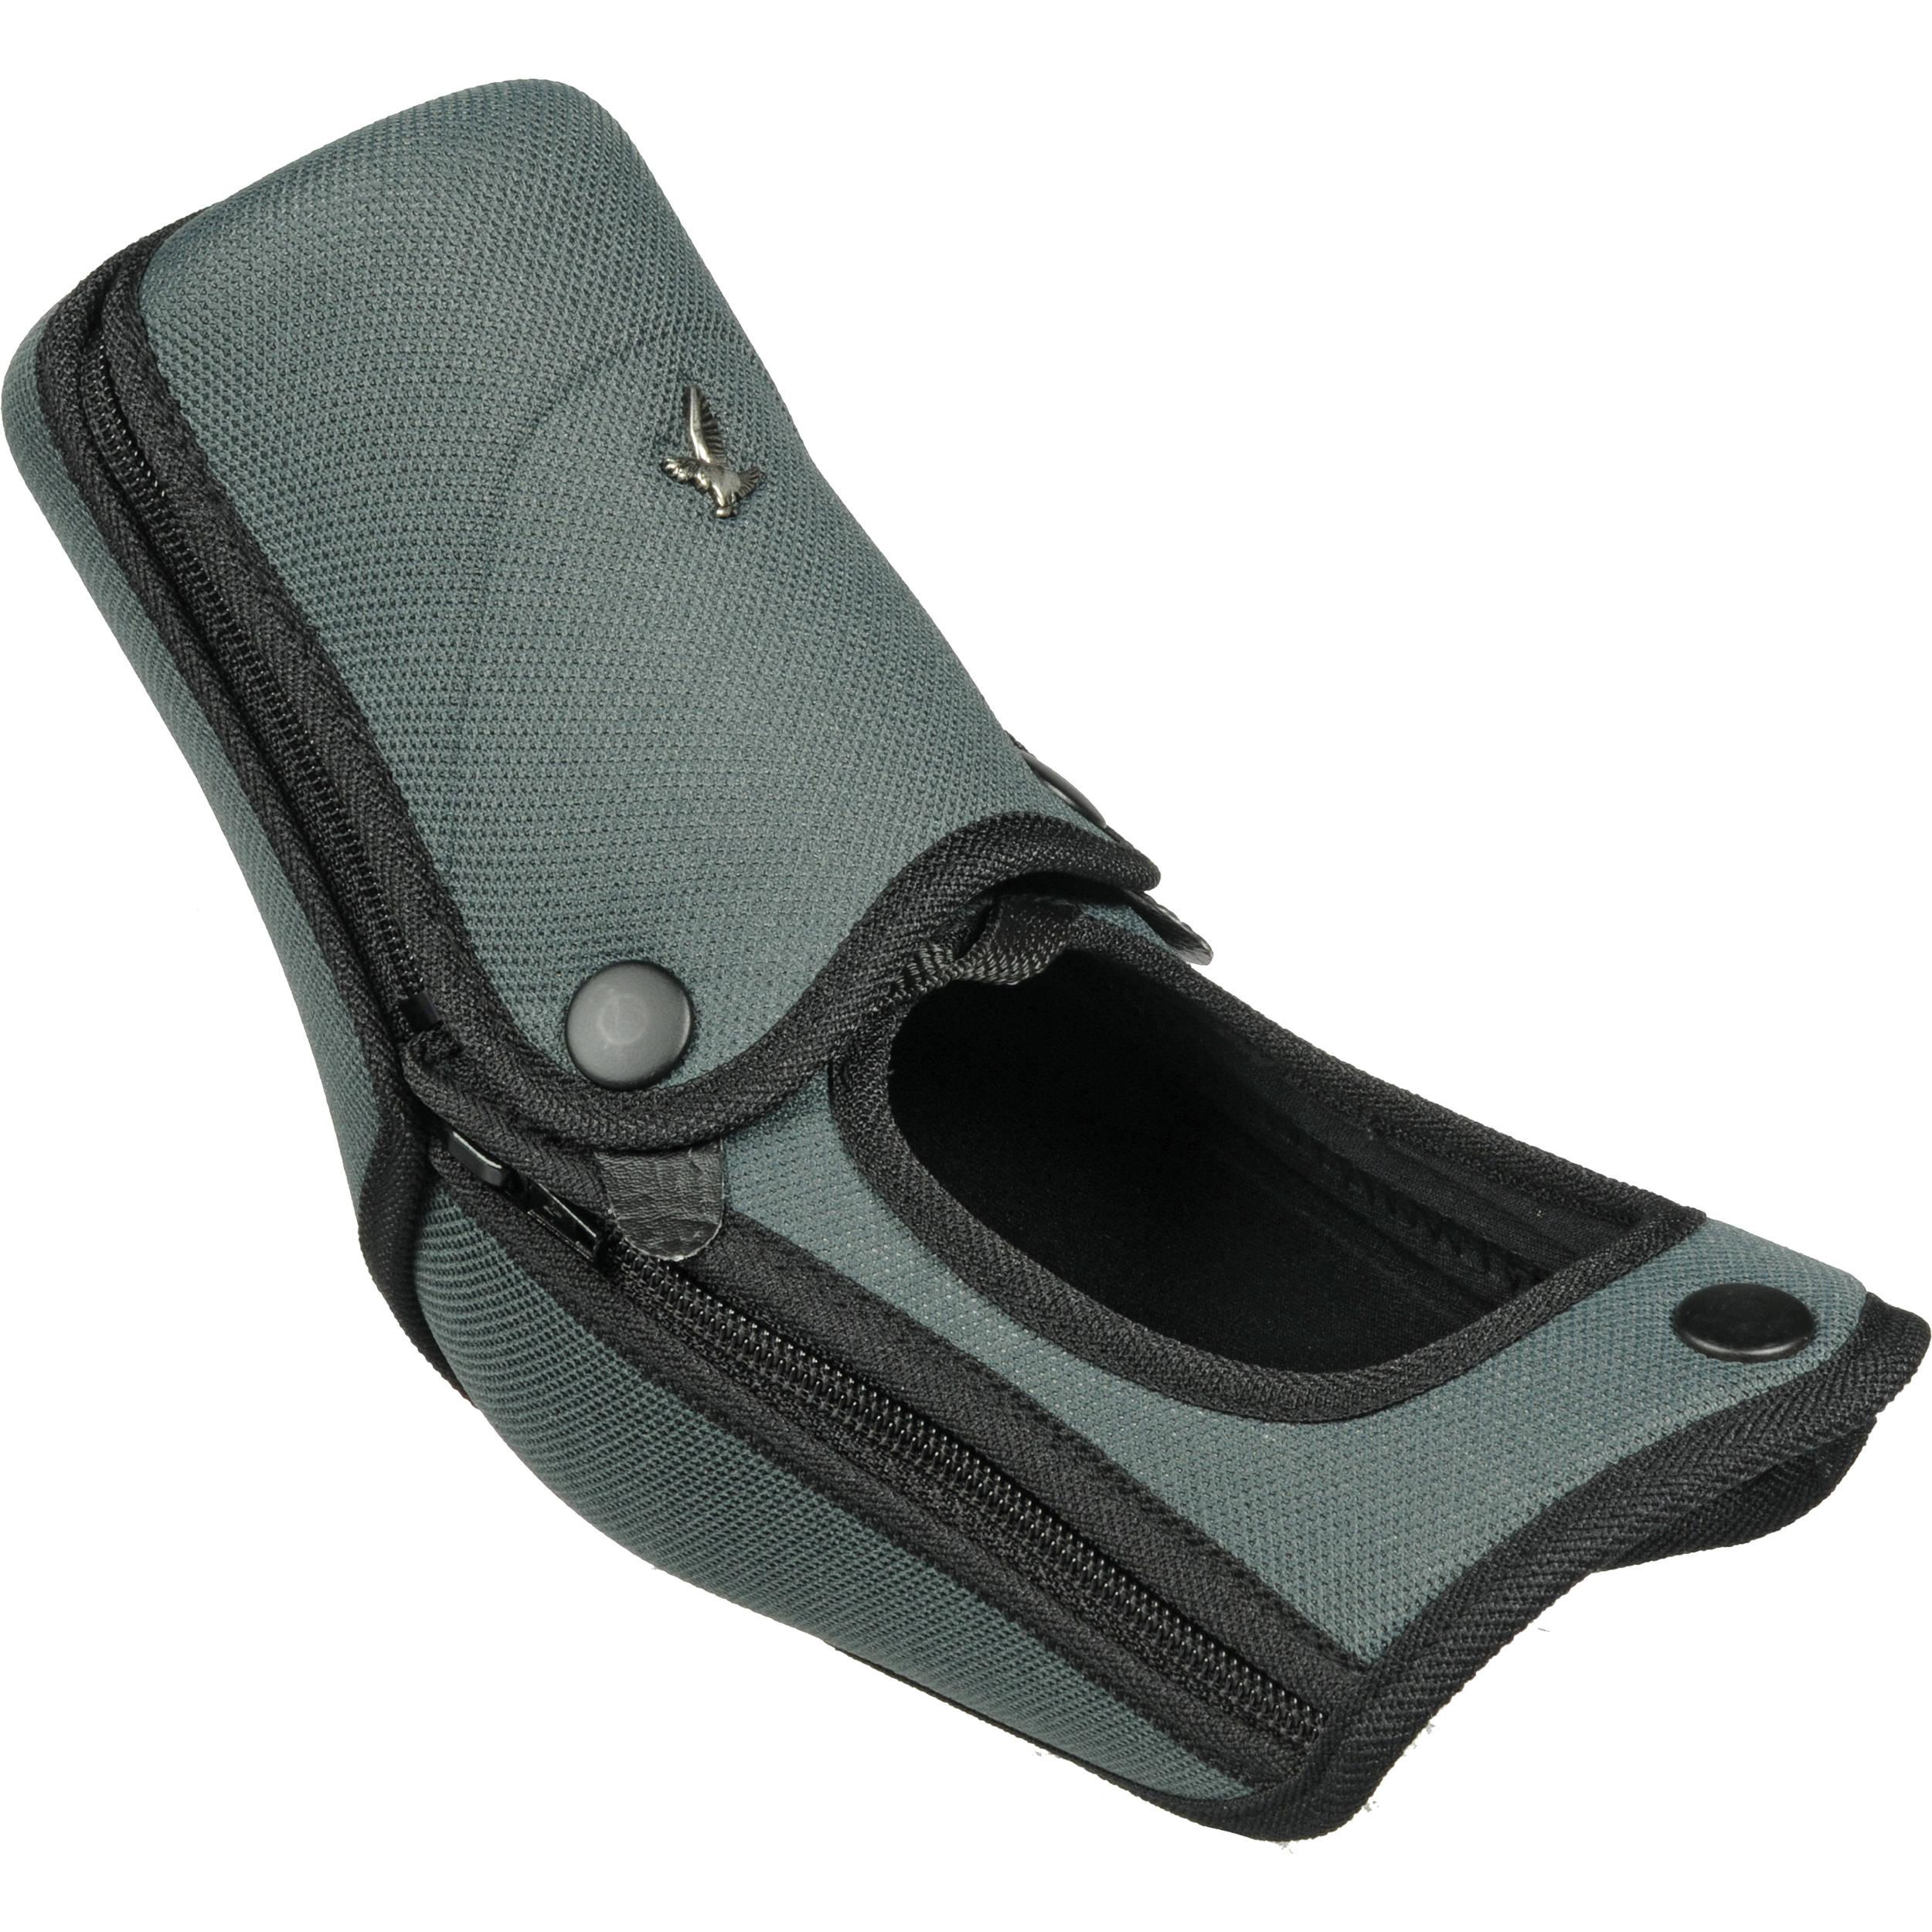 Swarovski Stay On Case Eyepiece Module For Atx Spotting 49953